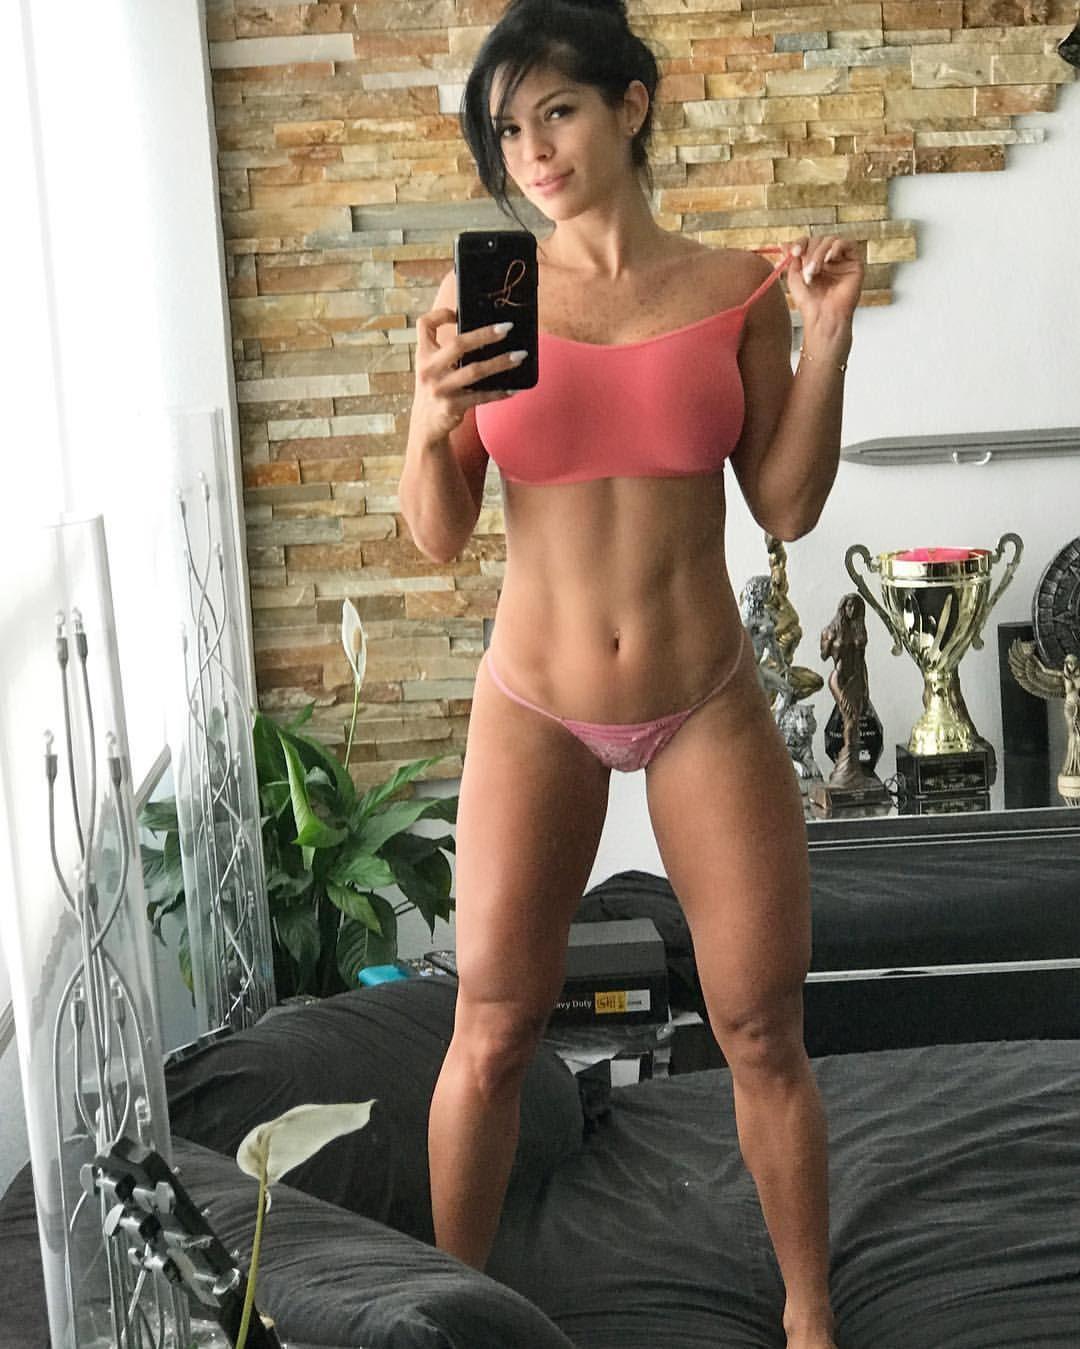 fucking posing men and women pics